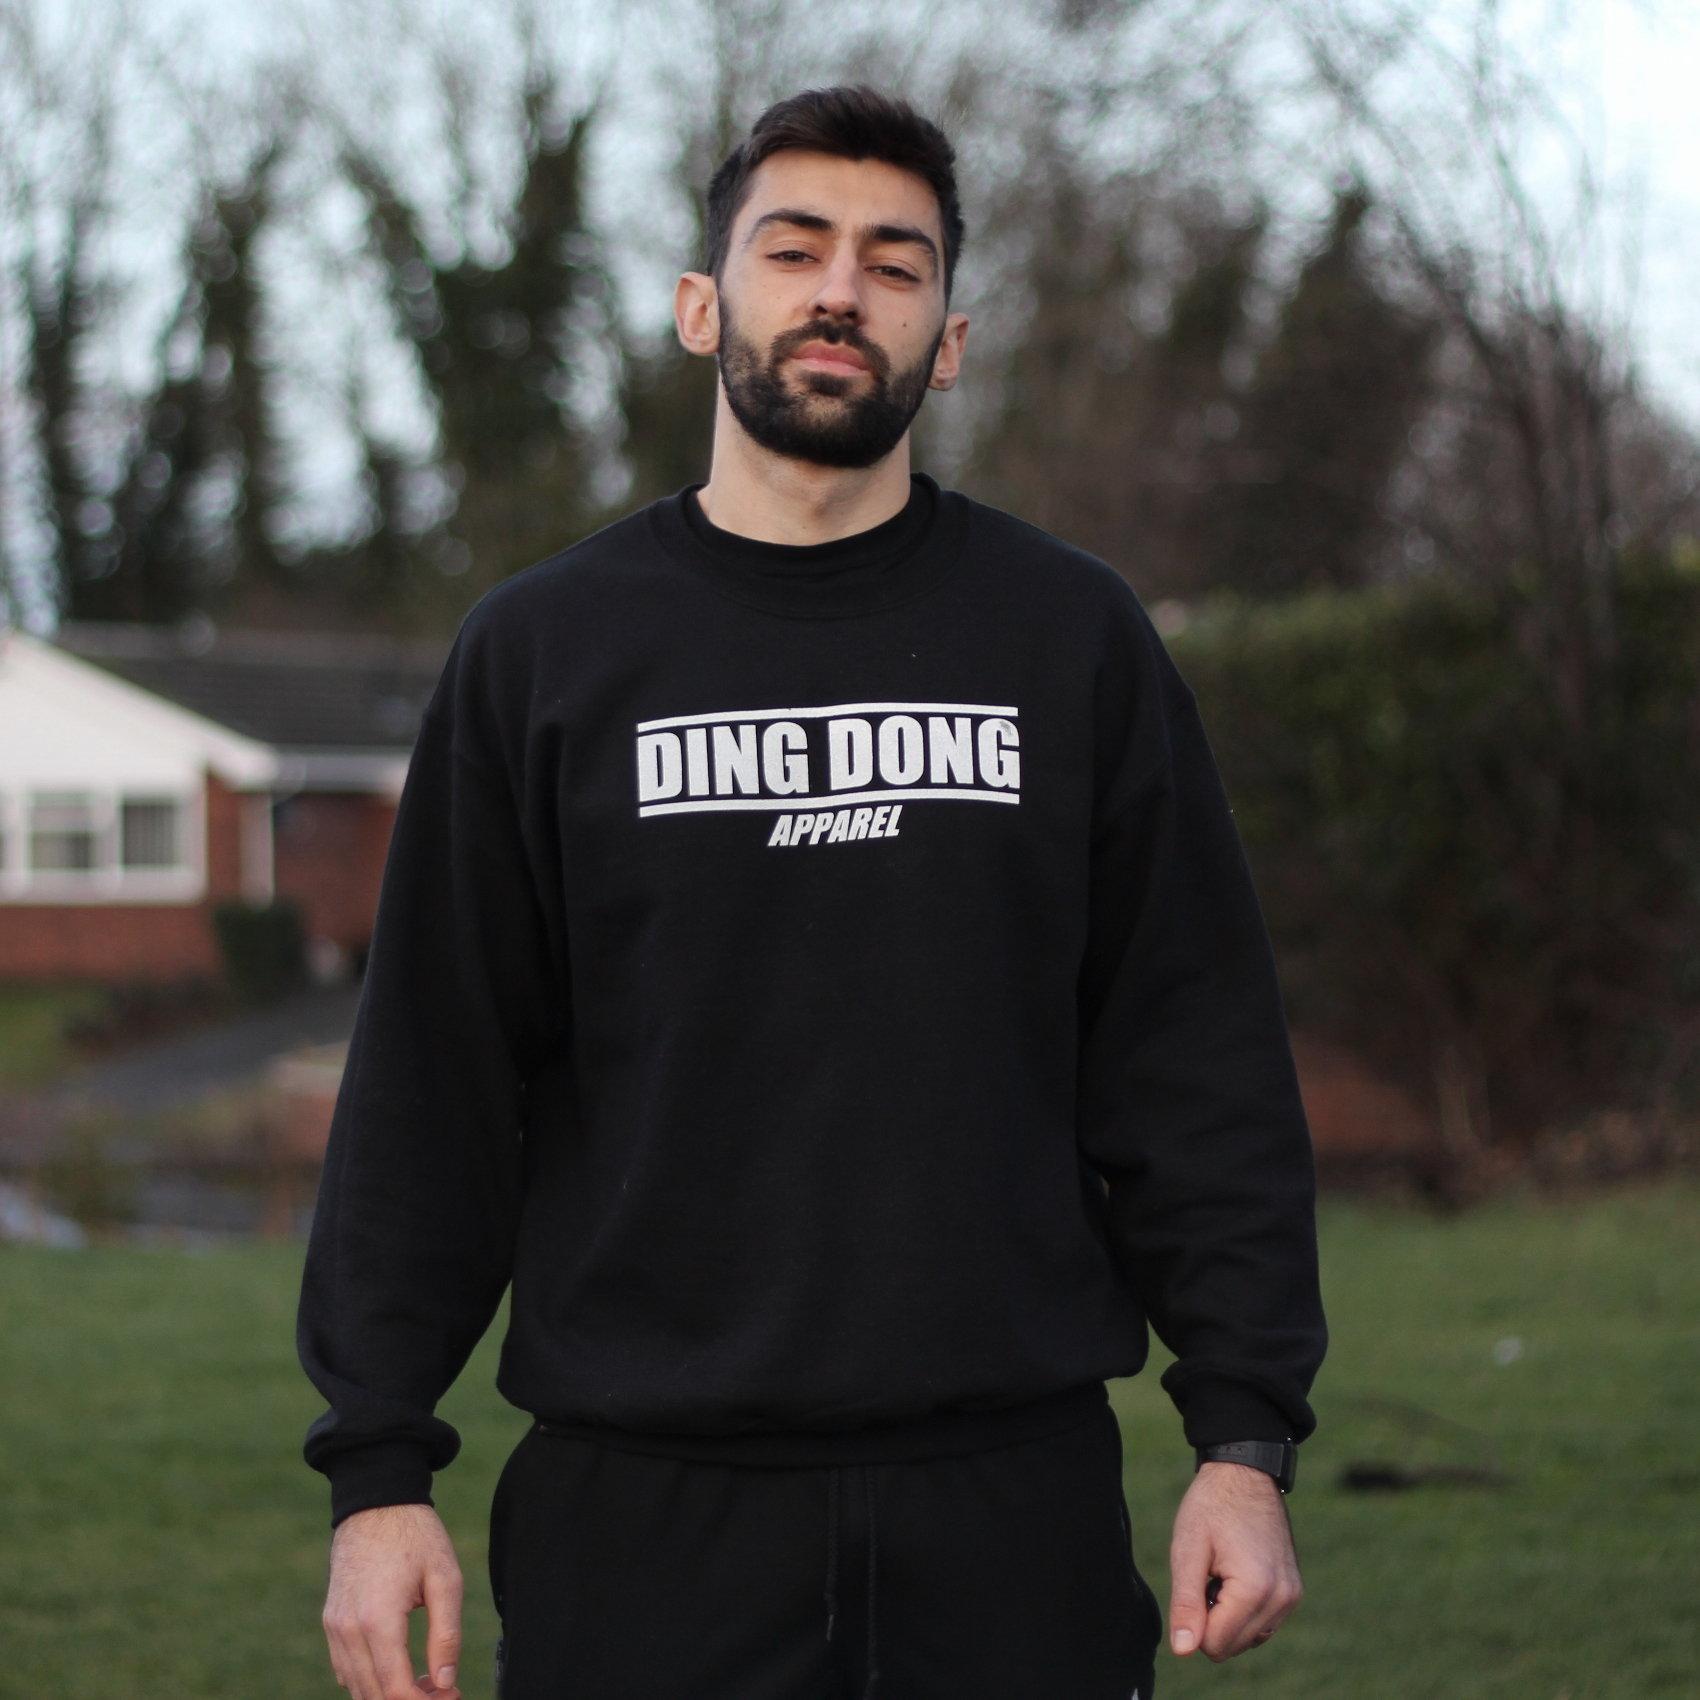 Large Print Sweatshirt - Black